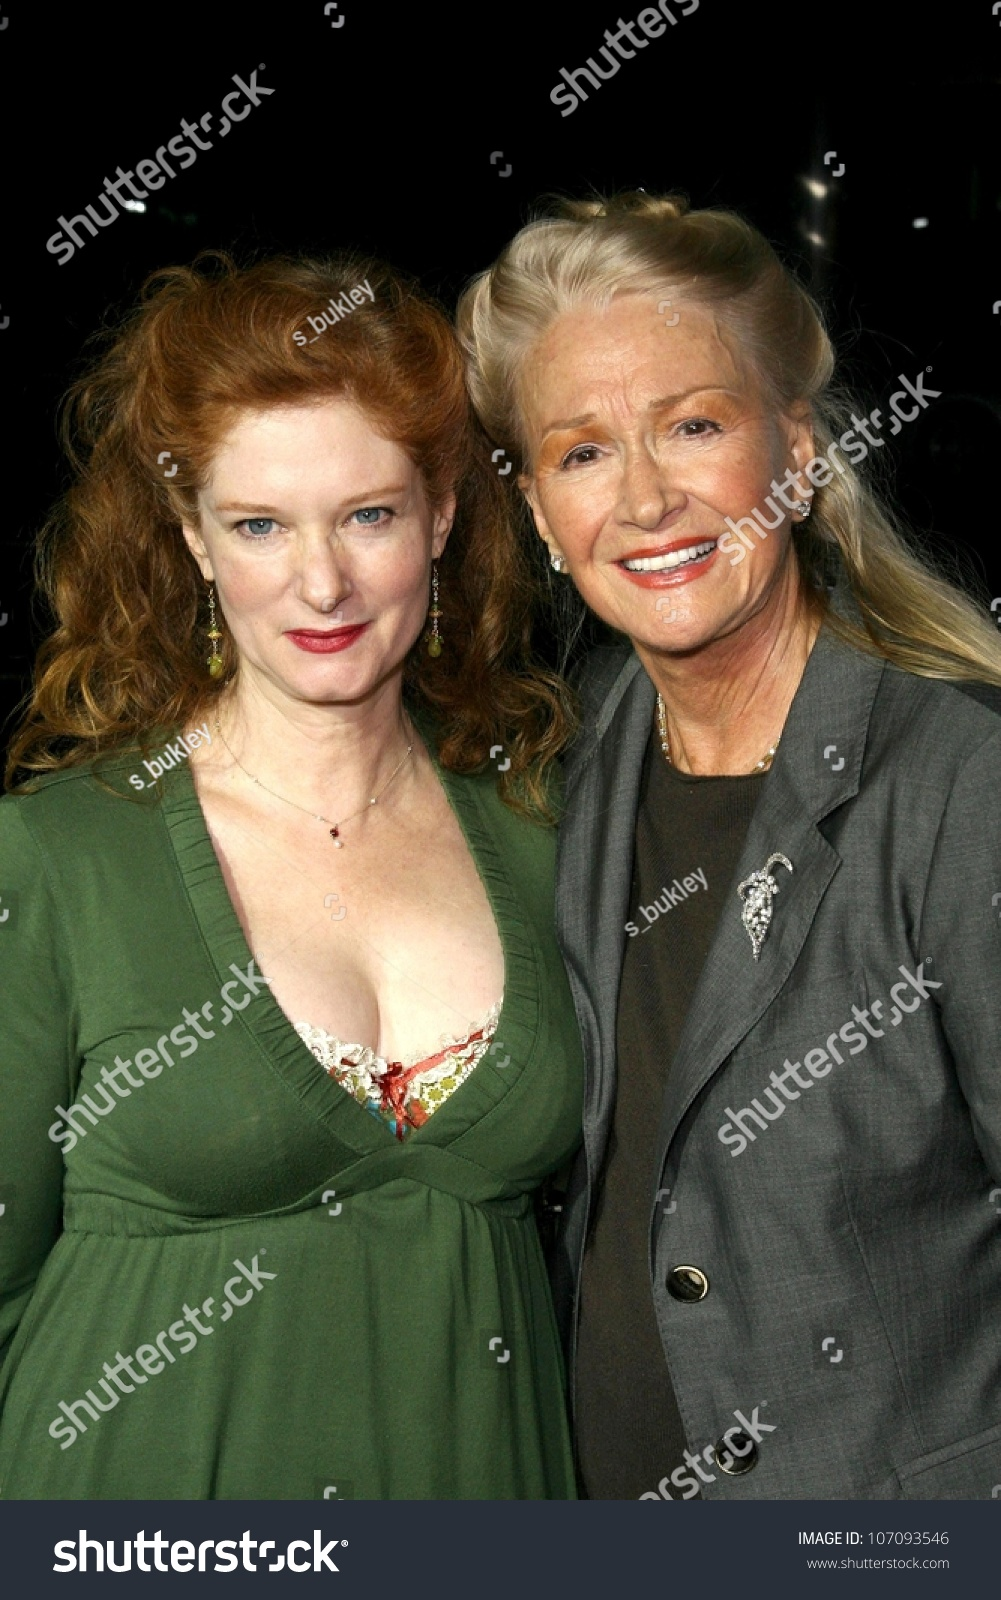 Julianne Nicholson,Dawn Zulueta (b. 1969) XXX nude Audrey Landers,Myndy Crist